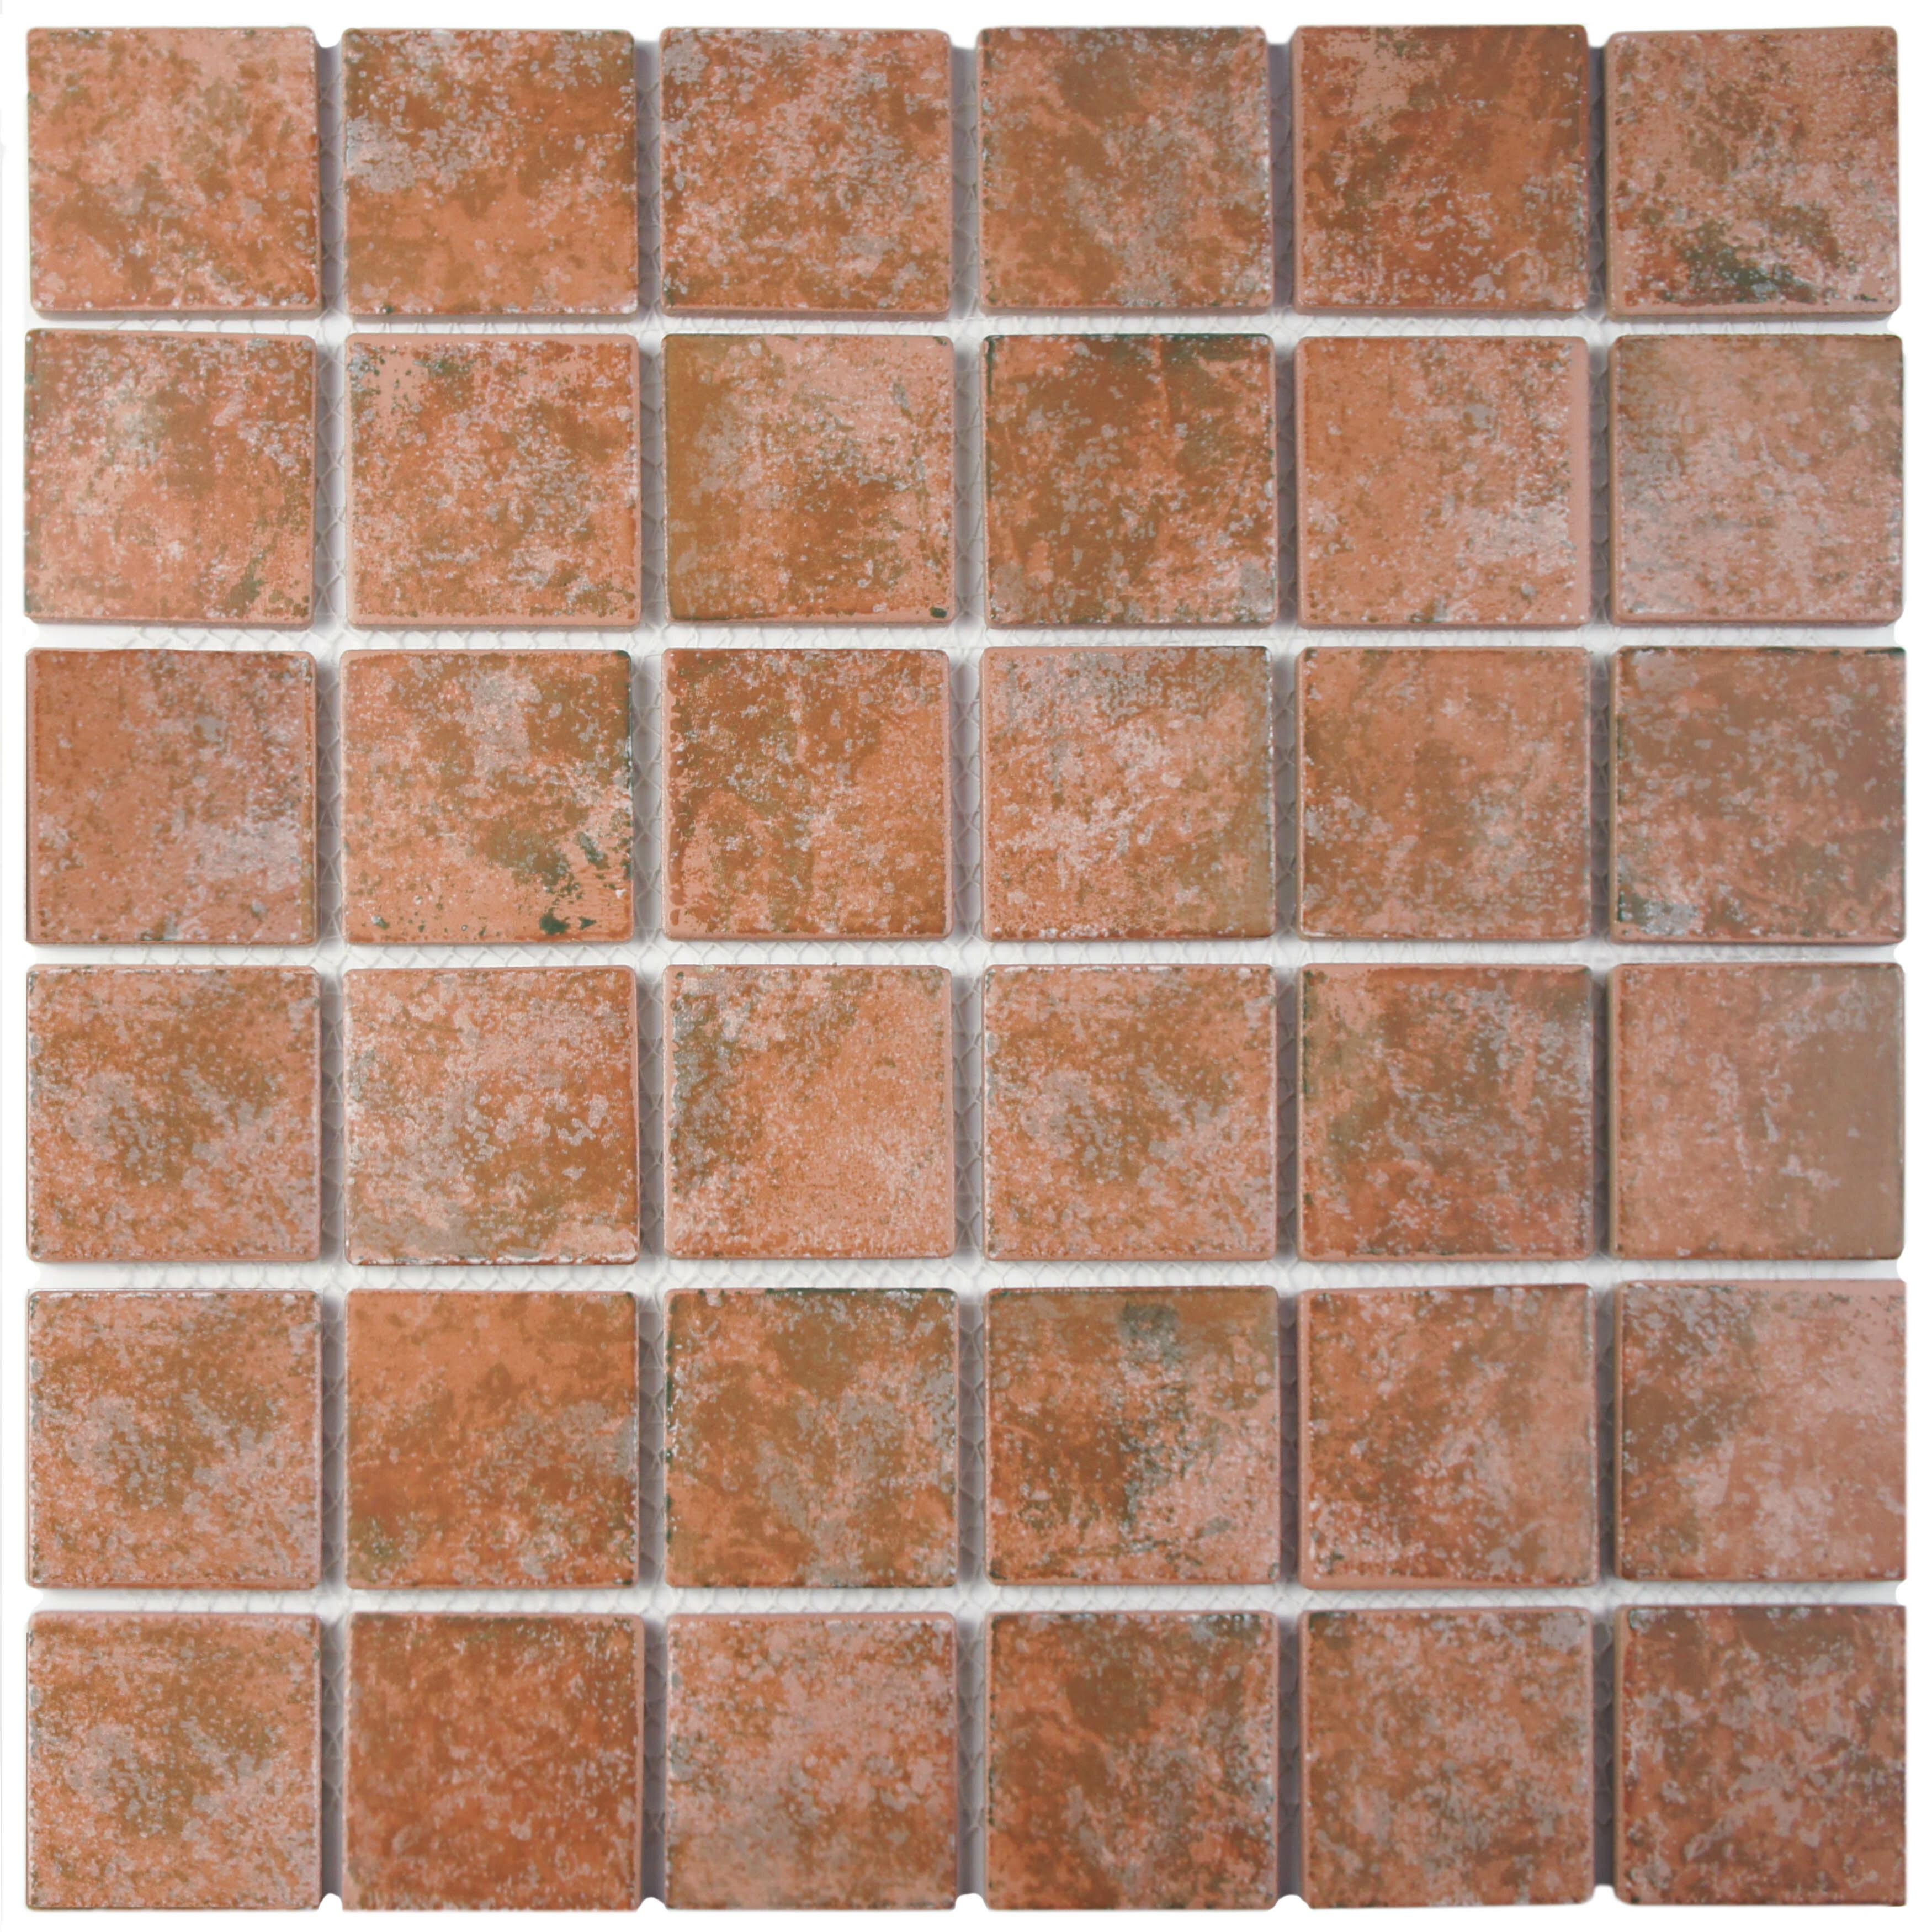 Elitetile elbert 2 x 2 porcelain mosaic tile in matte brown elitetile elbert 2 x 2 porcelain mosaic tile in matte brownorangegray reviews wayfair dailygadgetfo Images